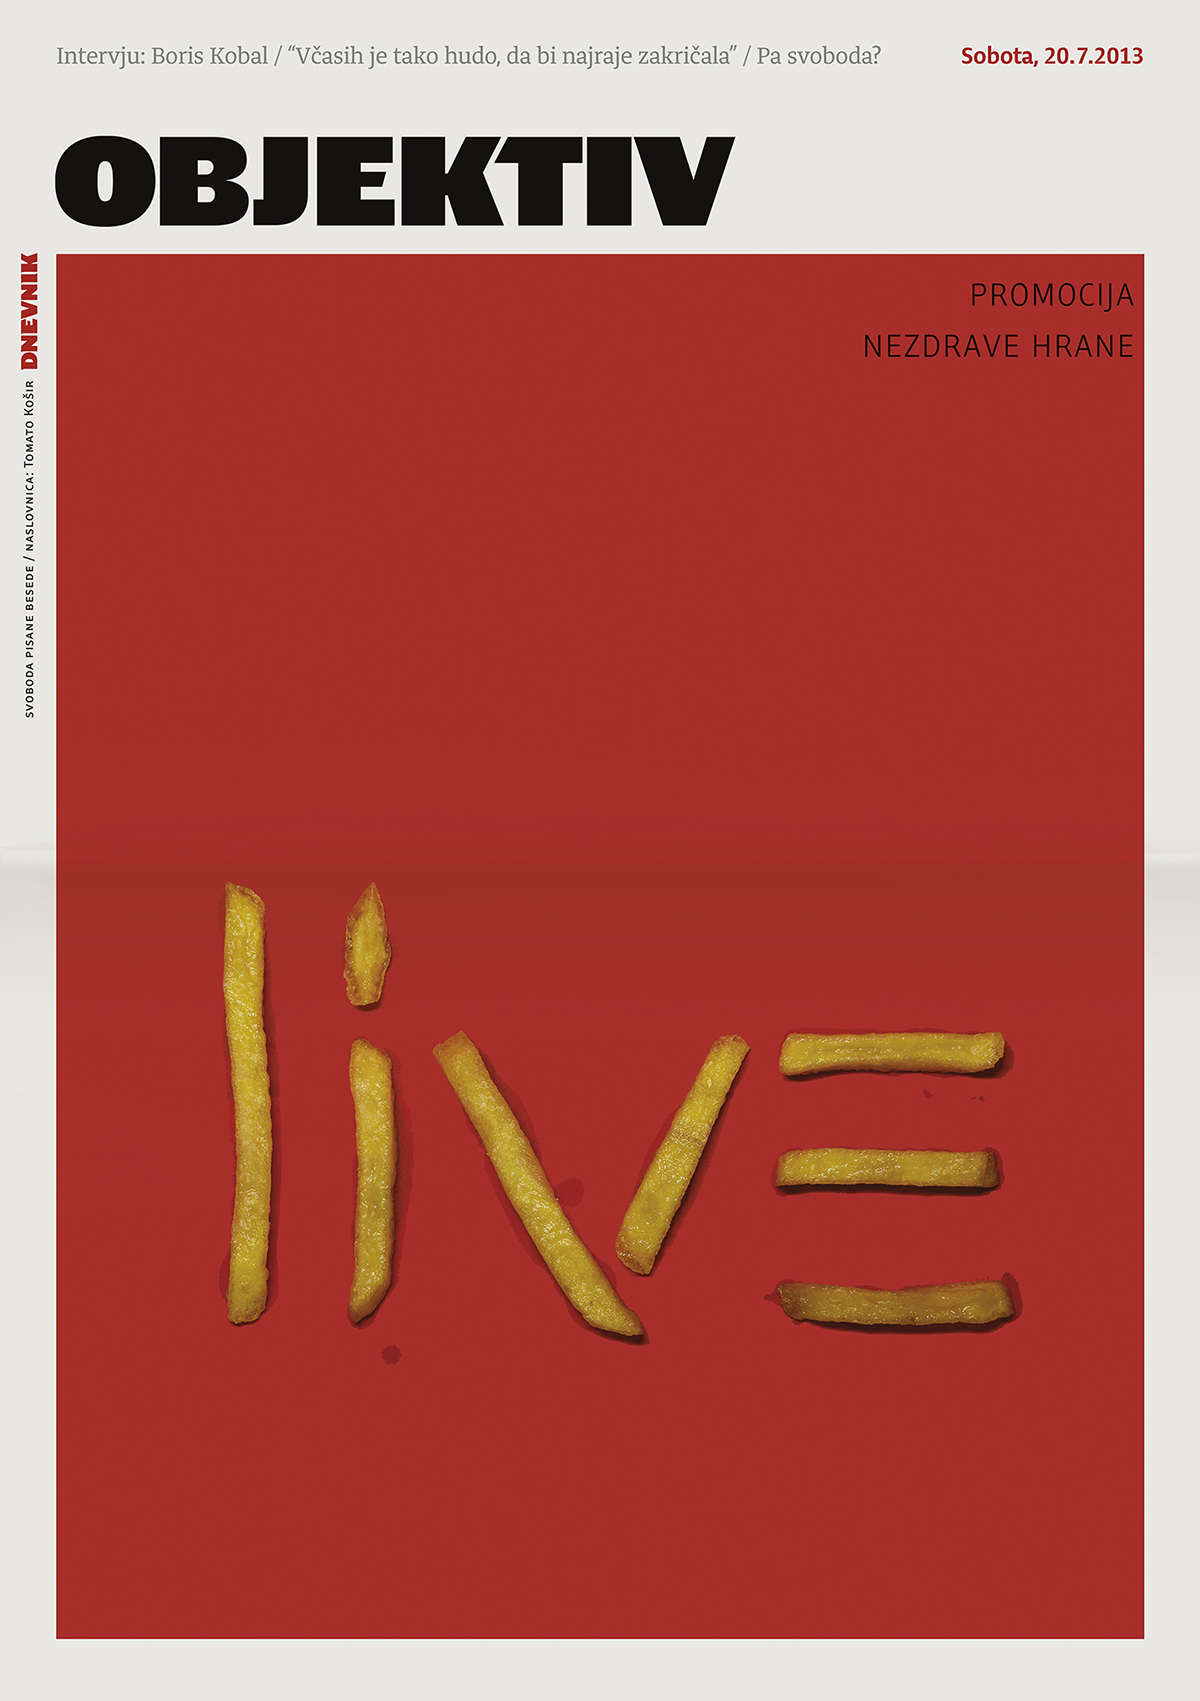 cover  newspaper Food   Fast food photo-illustration Editorial Illustration objektiv tomato košir slovenia award McDonalds Fast food evil live grand-prix